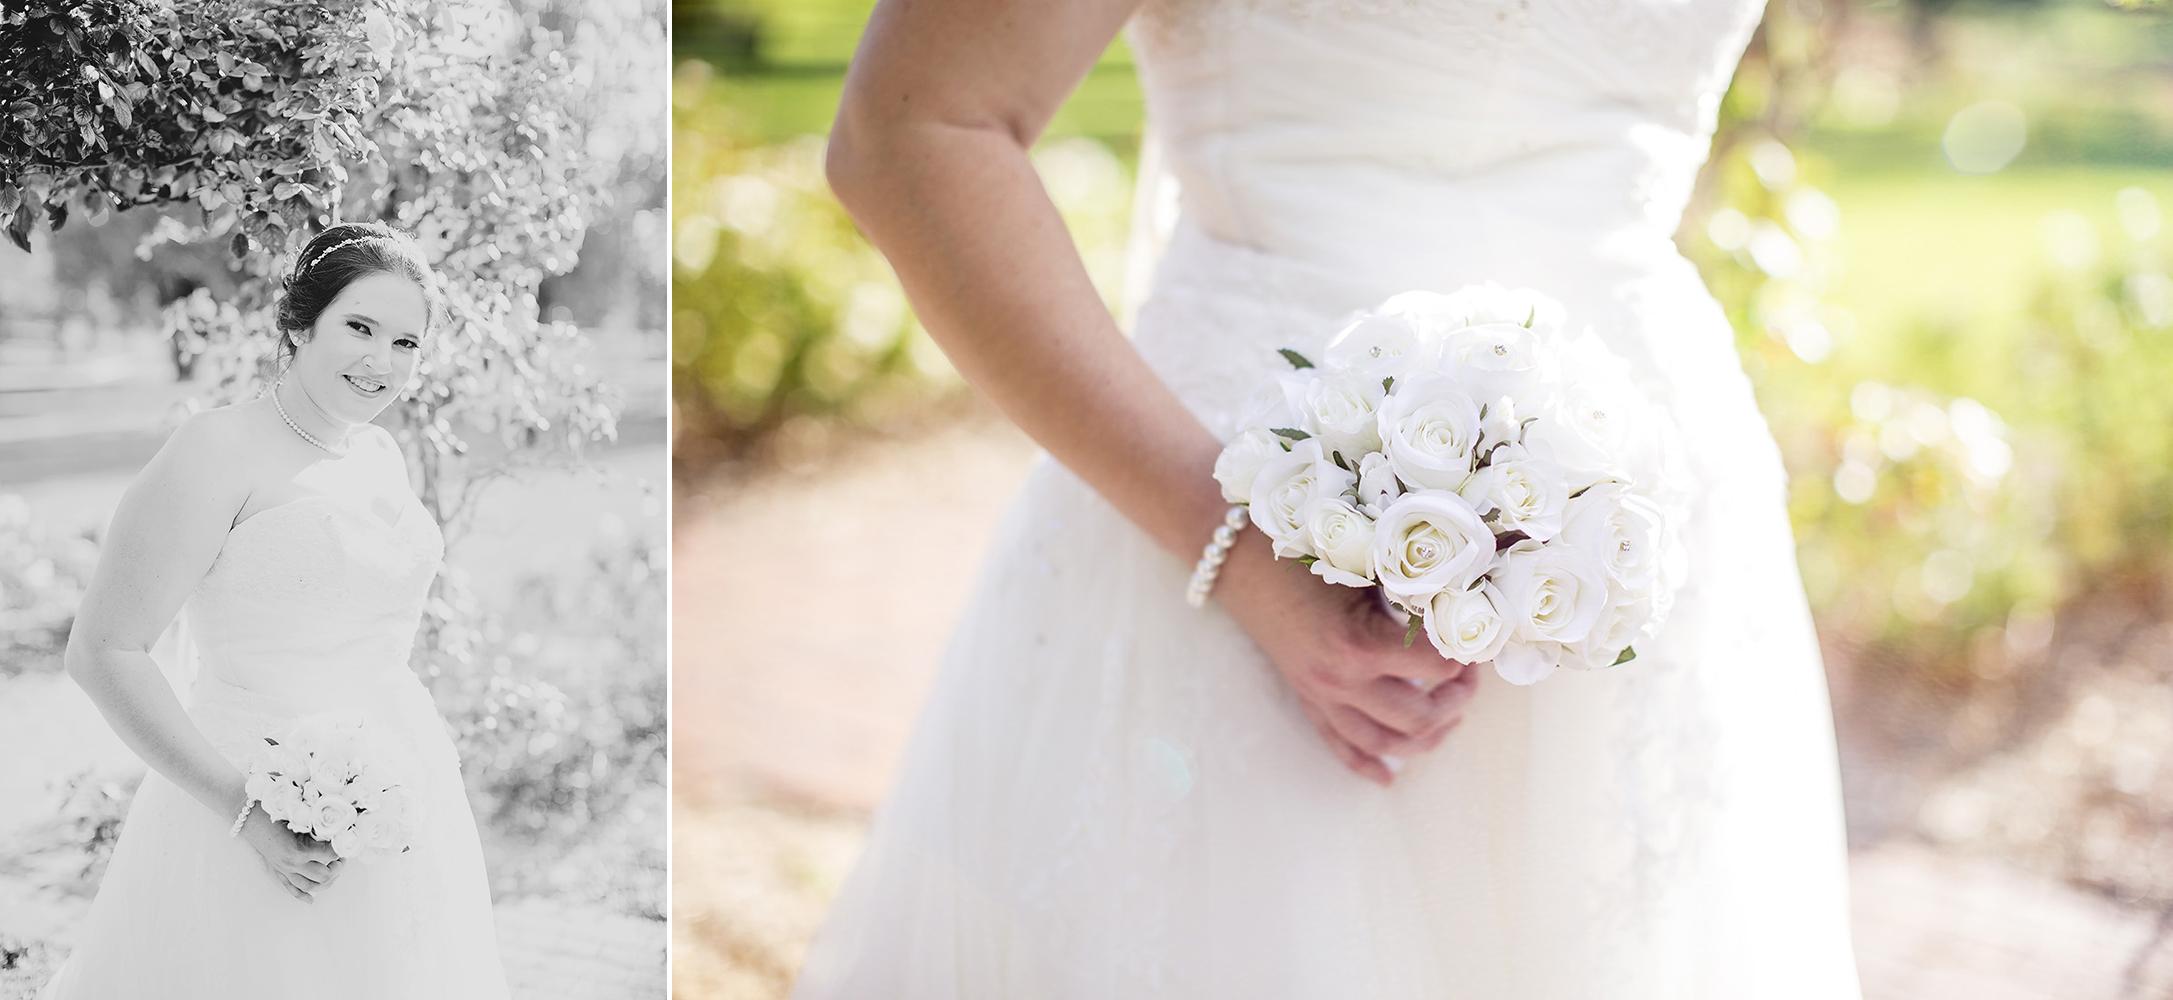 Dreamy Adelaide Veal Gardens Wedding Photo 11.jpg